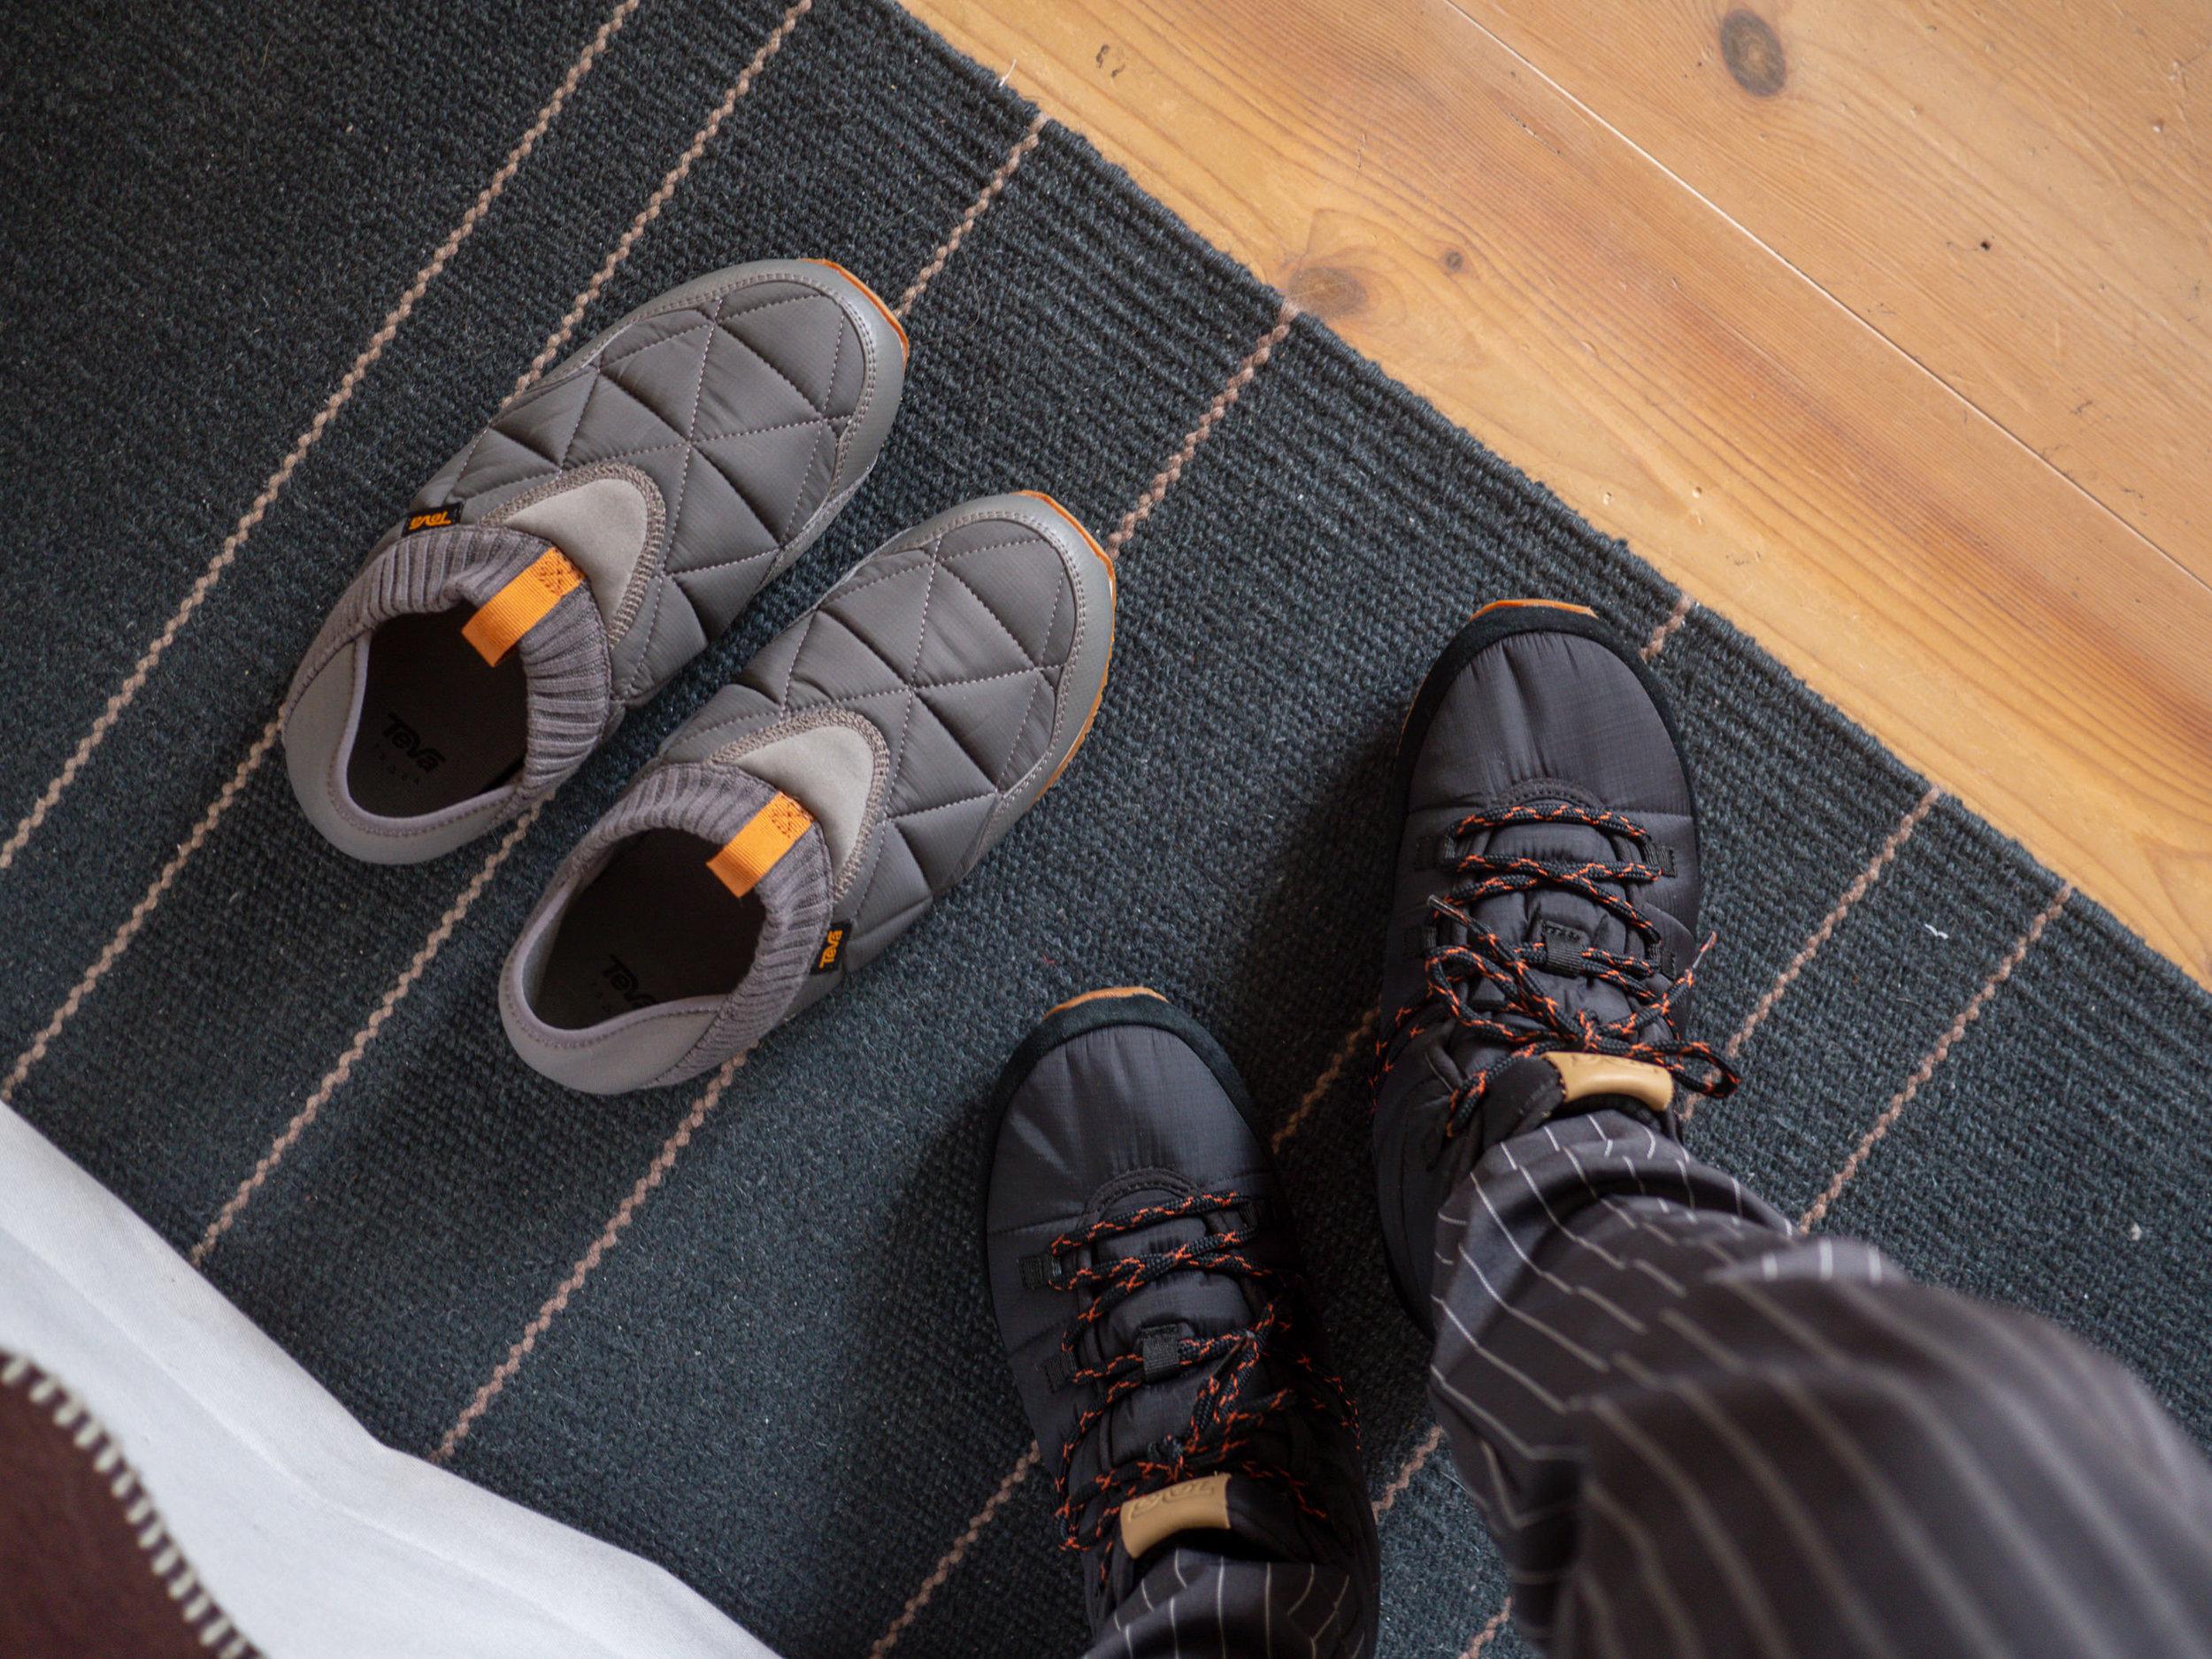 MYBELONGING-TOMMYLEI-TEVA-FOOTWEAR-SNEAKERS-EMBER-MOC-BOOTS-IN-STOCKHOLM-SWEDEN-TRAVEL-PHOTOGRAPHY30.jpg